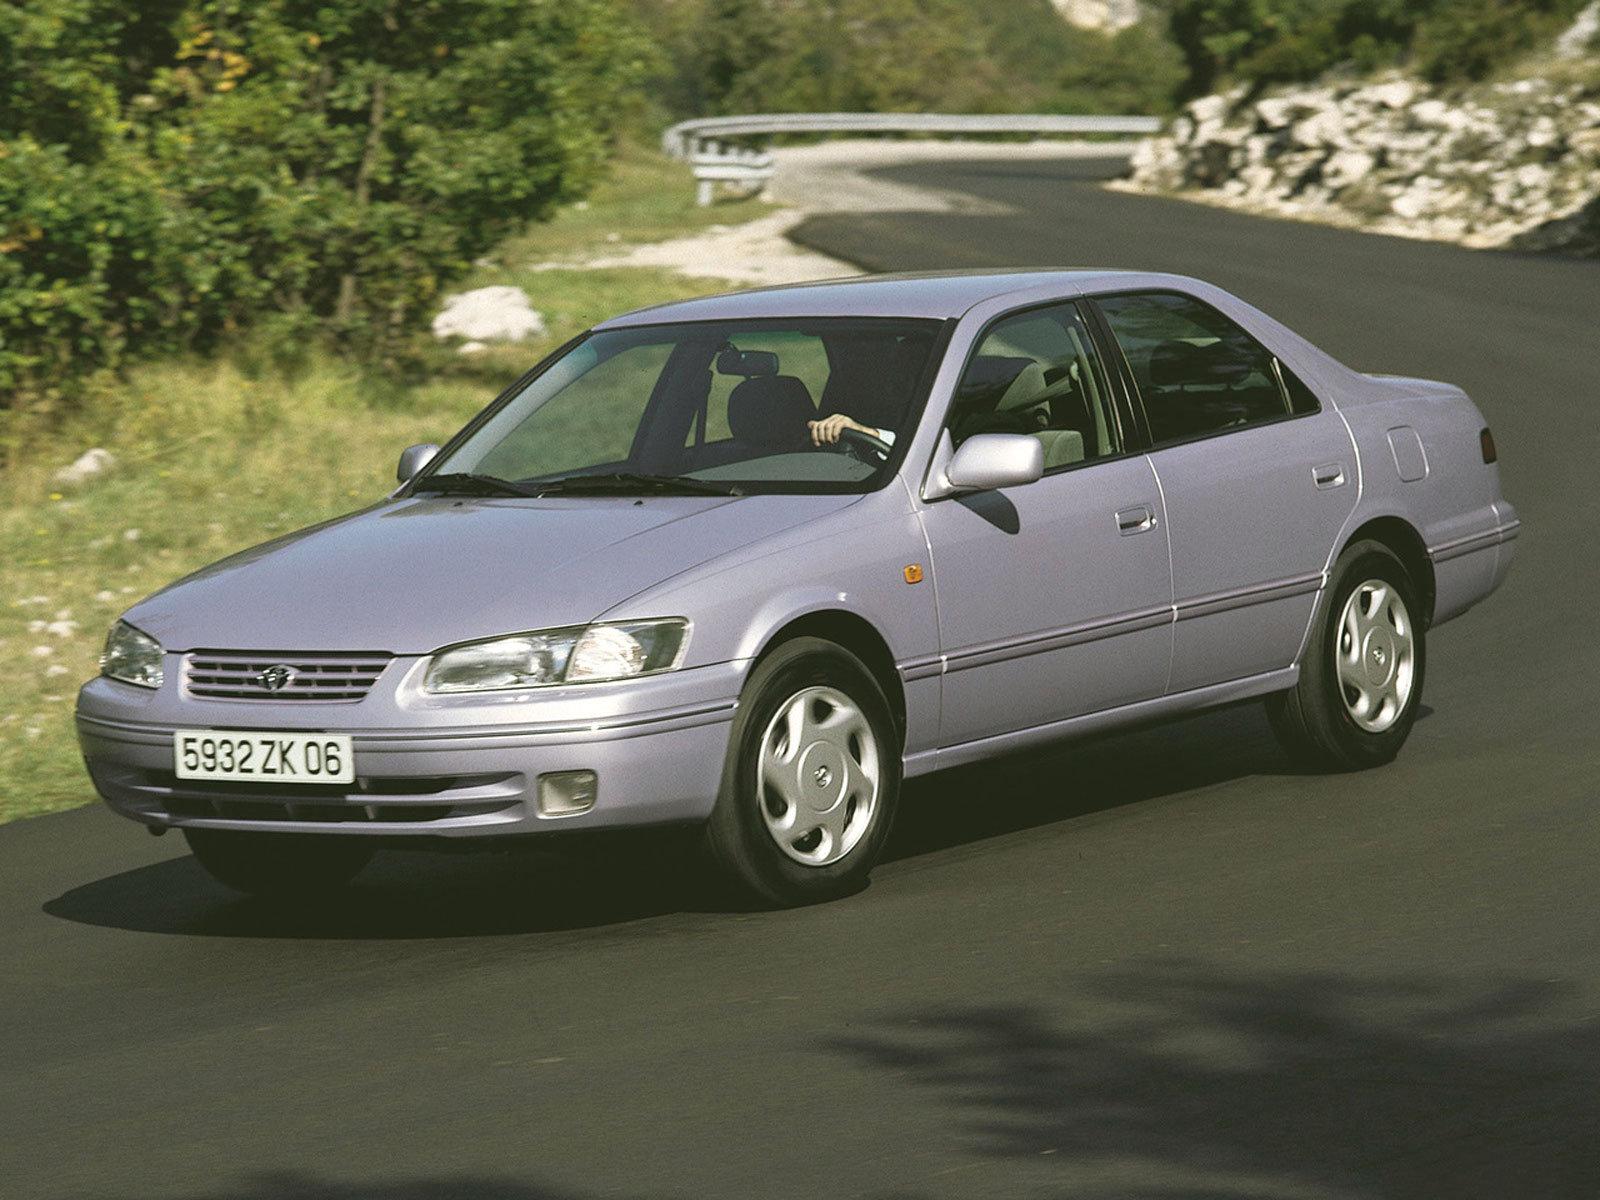 Toyota (Тойота) Camry 1996-1999 г.